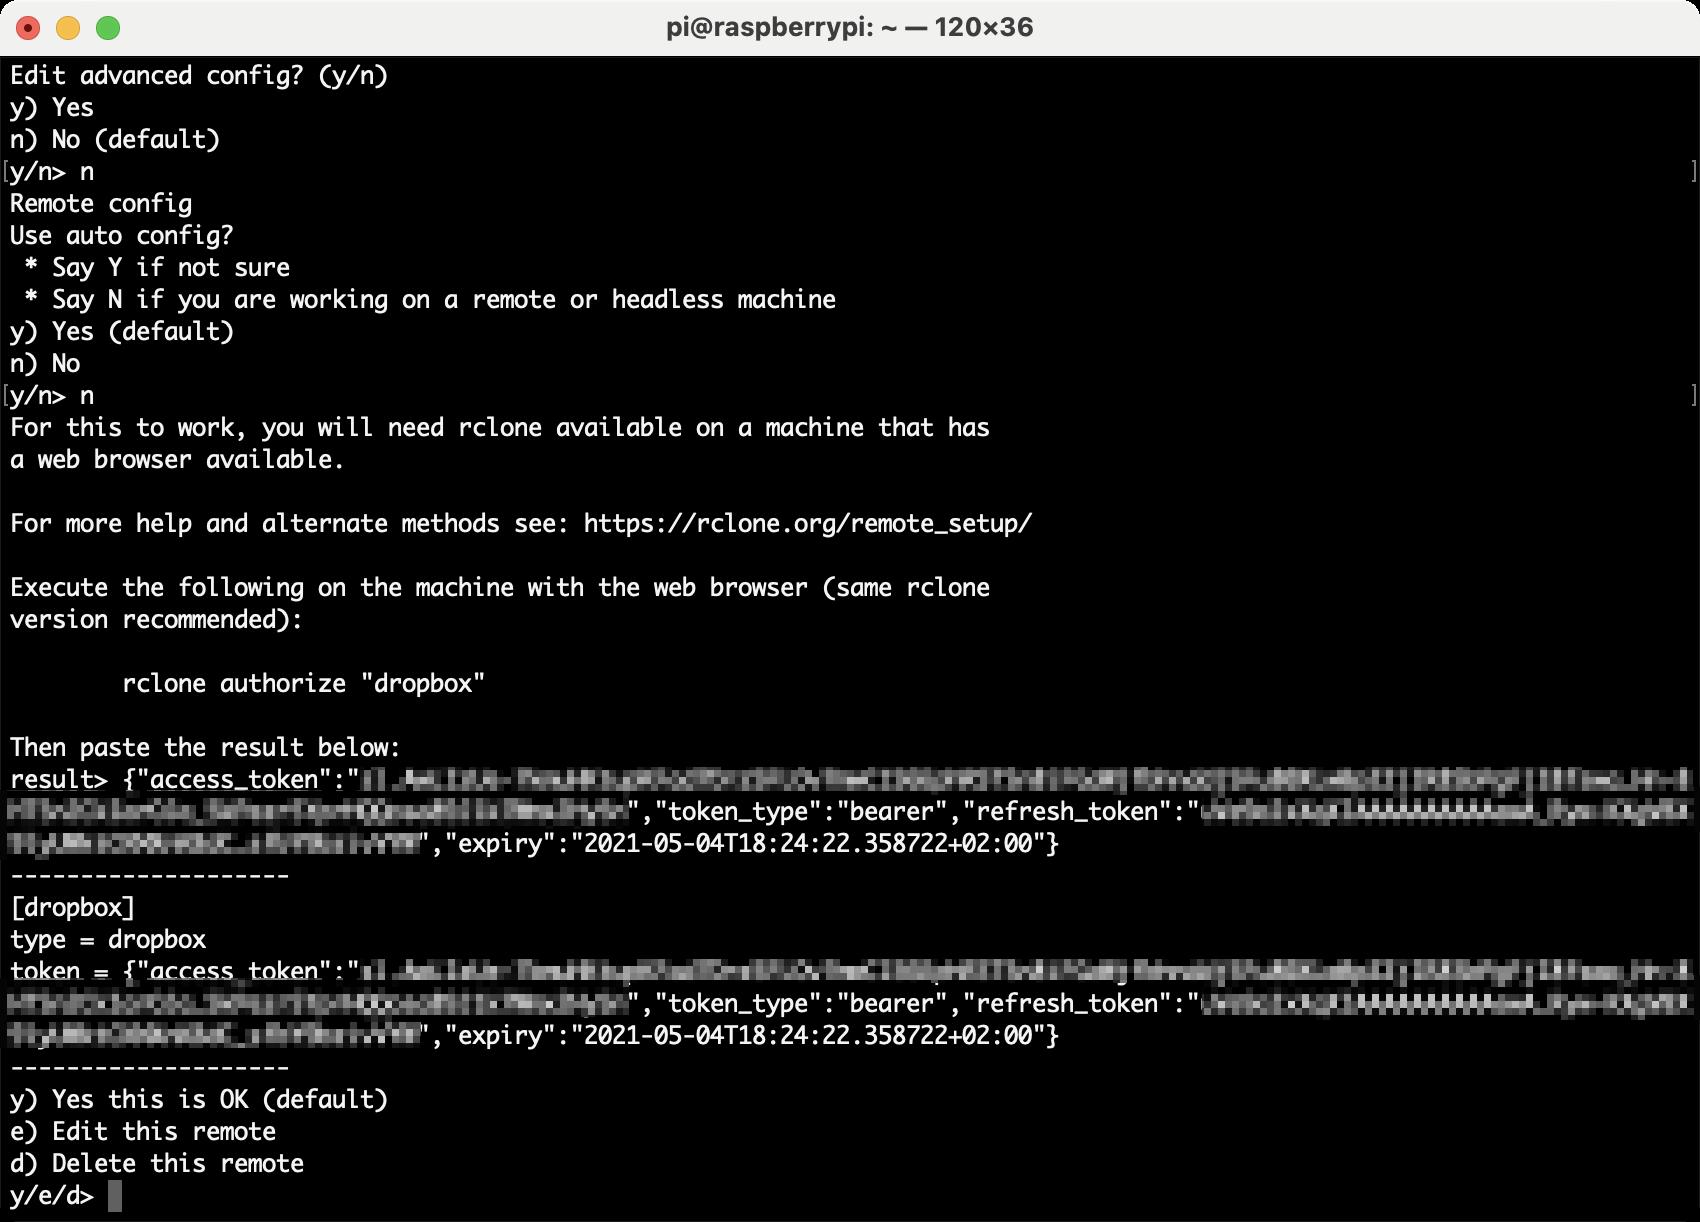 Authorizing Dropbox using rclone